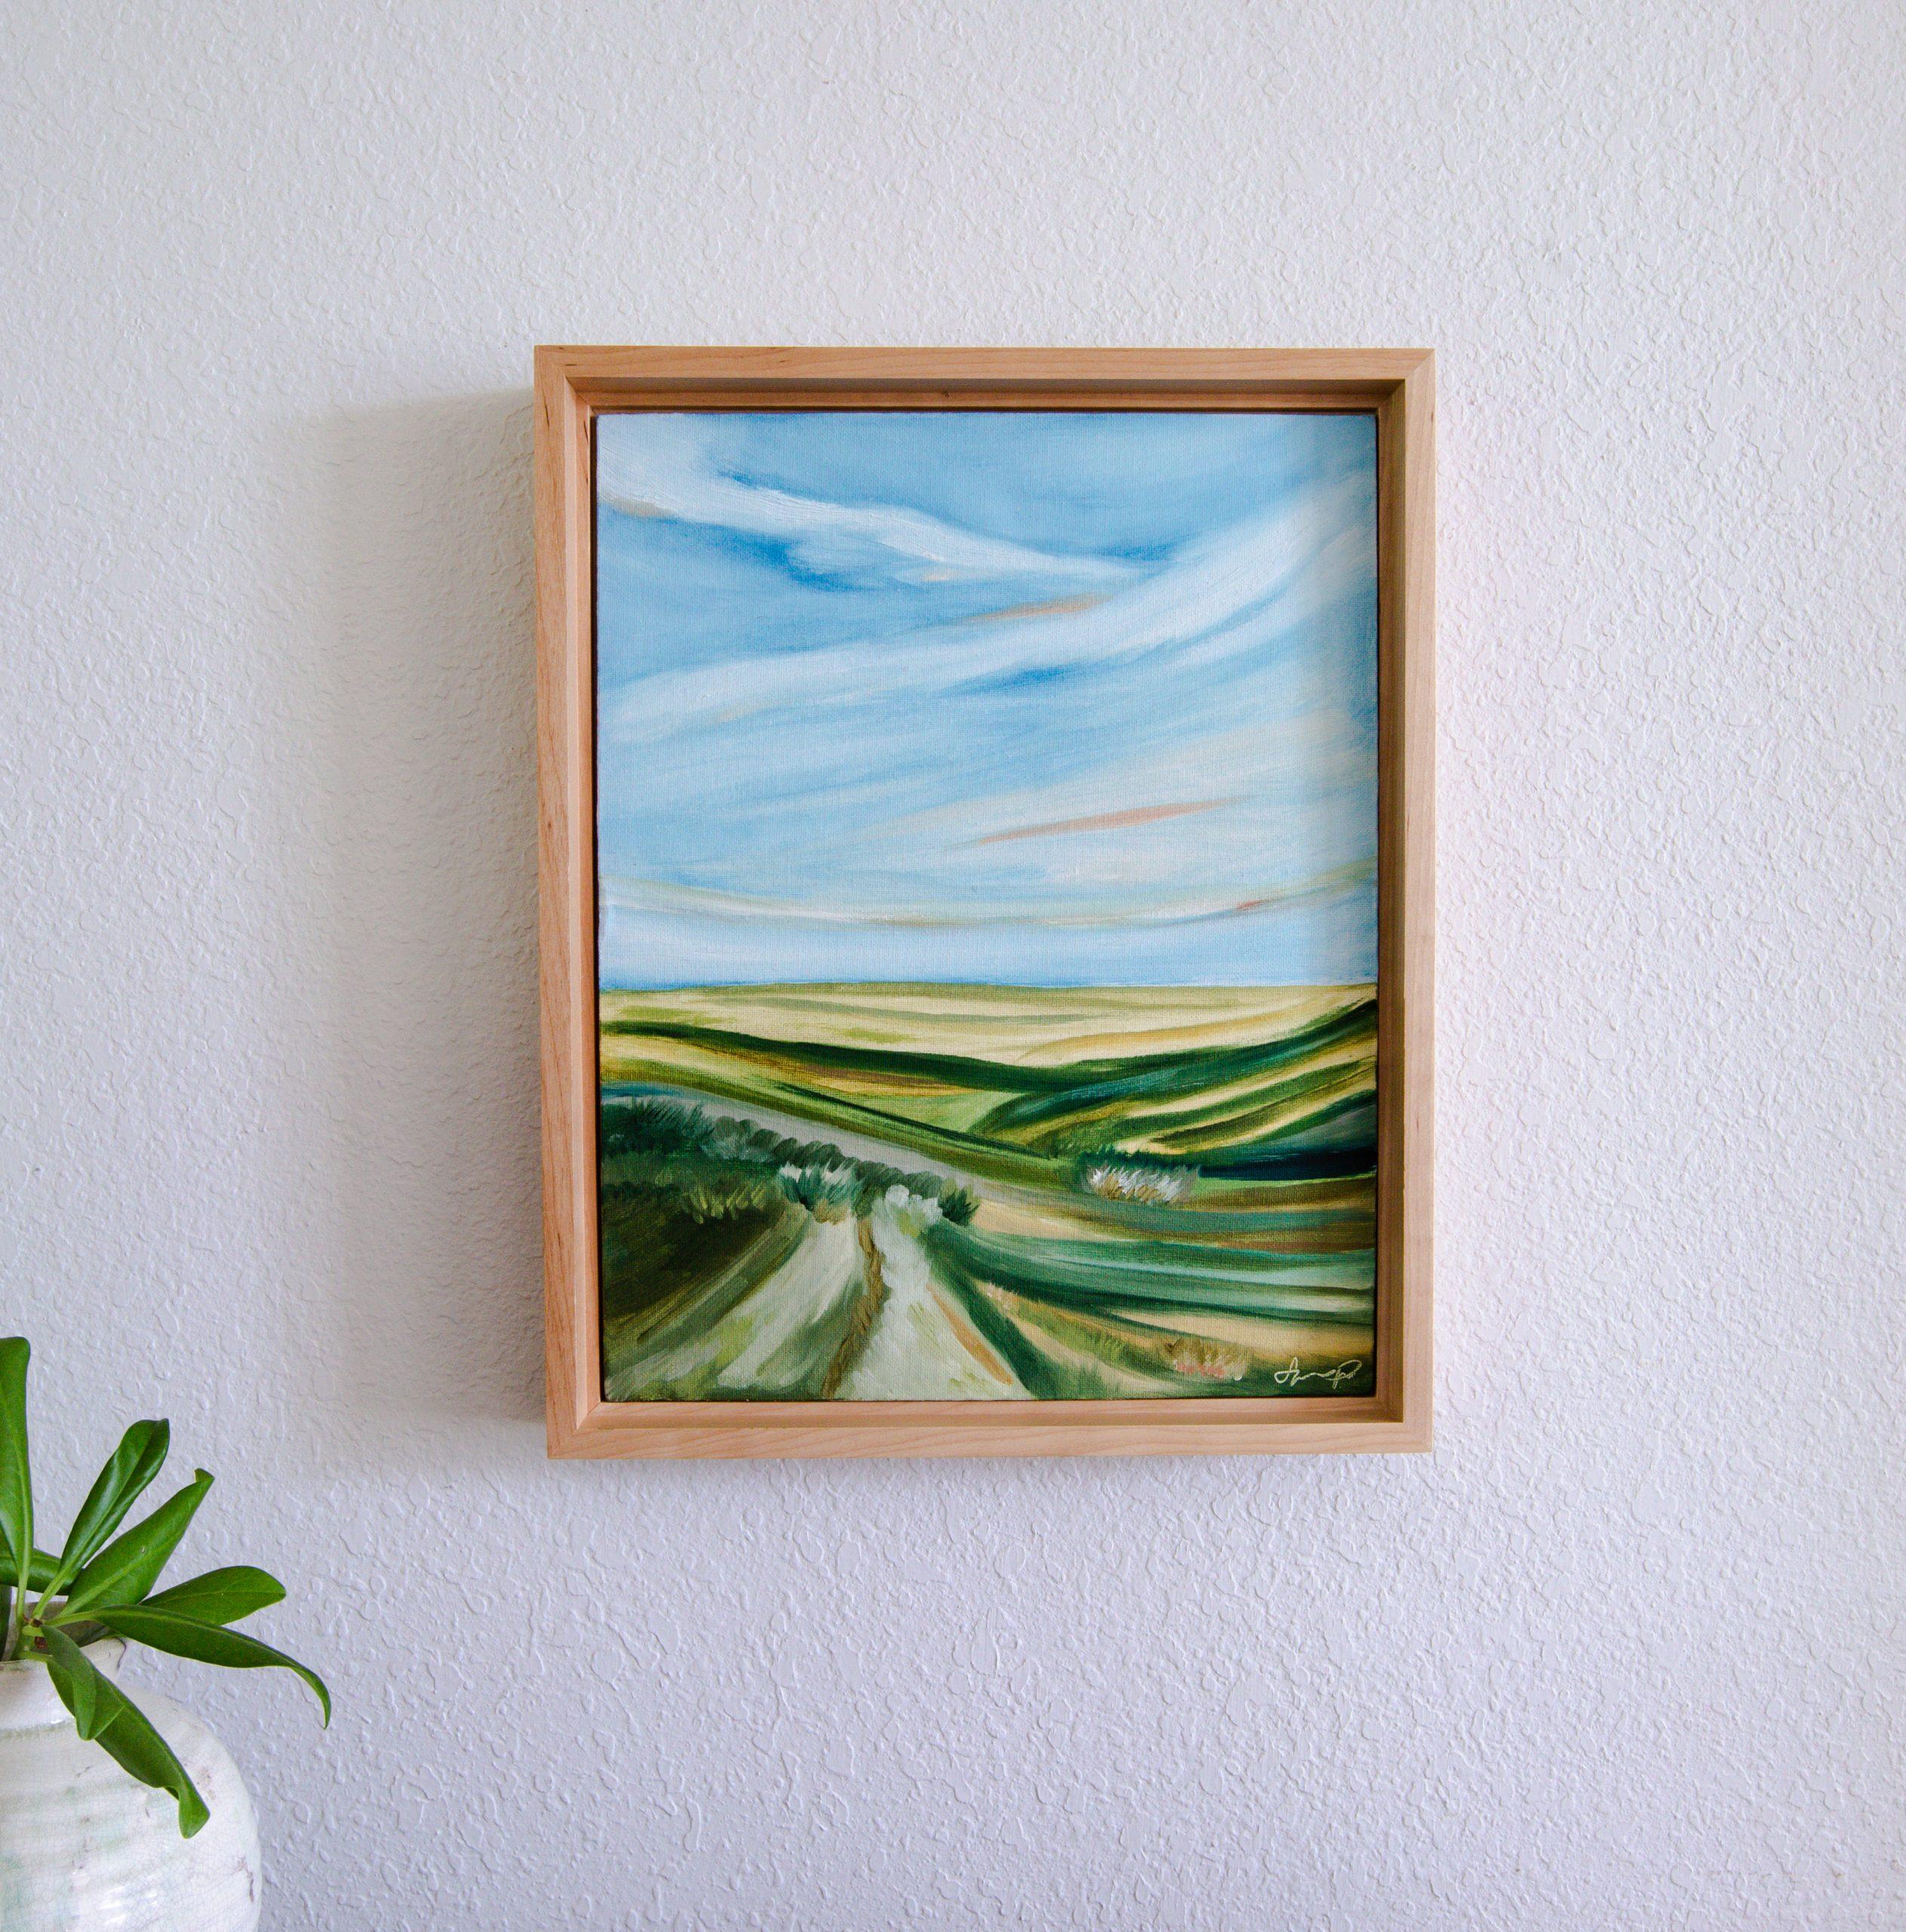 Magic + Landscapes Collection | Landscape Paintings for Sale | Shaunna West | Loose, Modern Landscapes